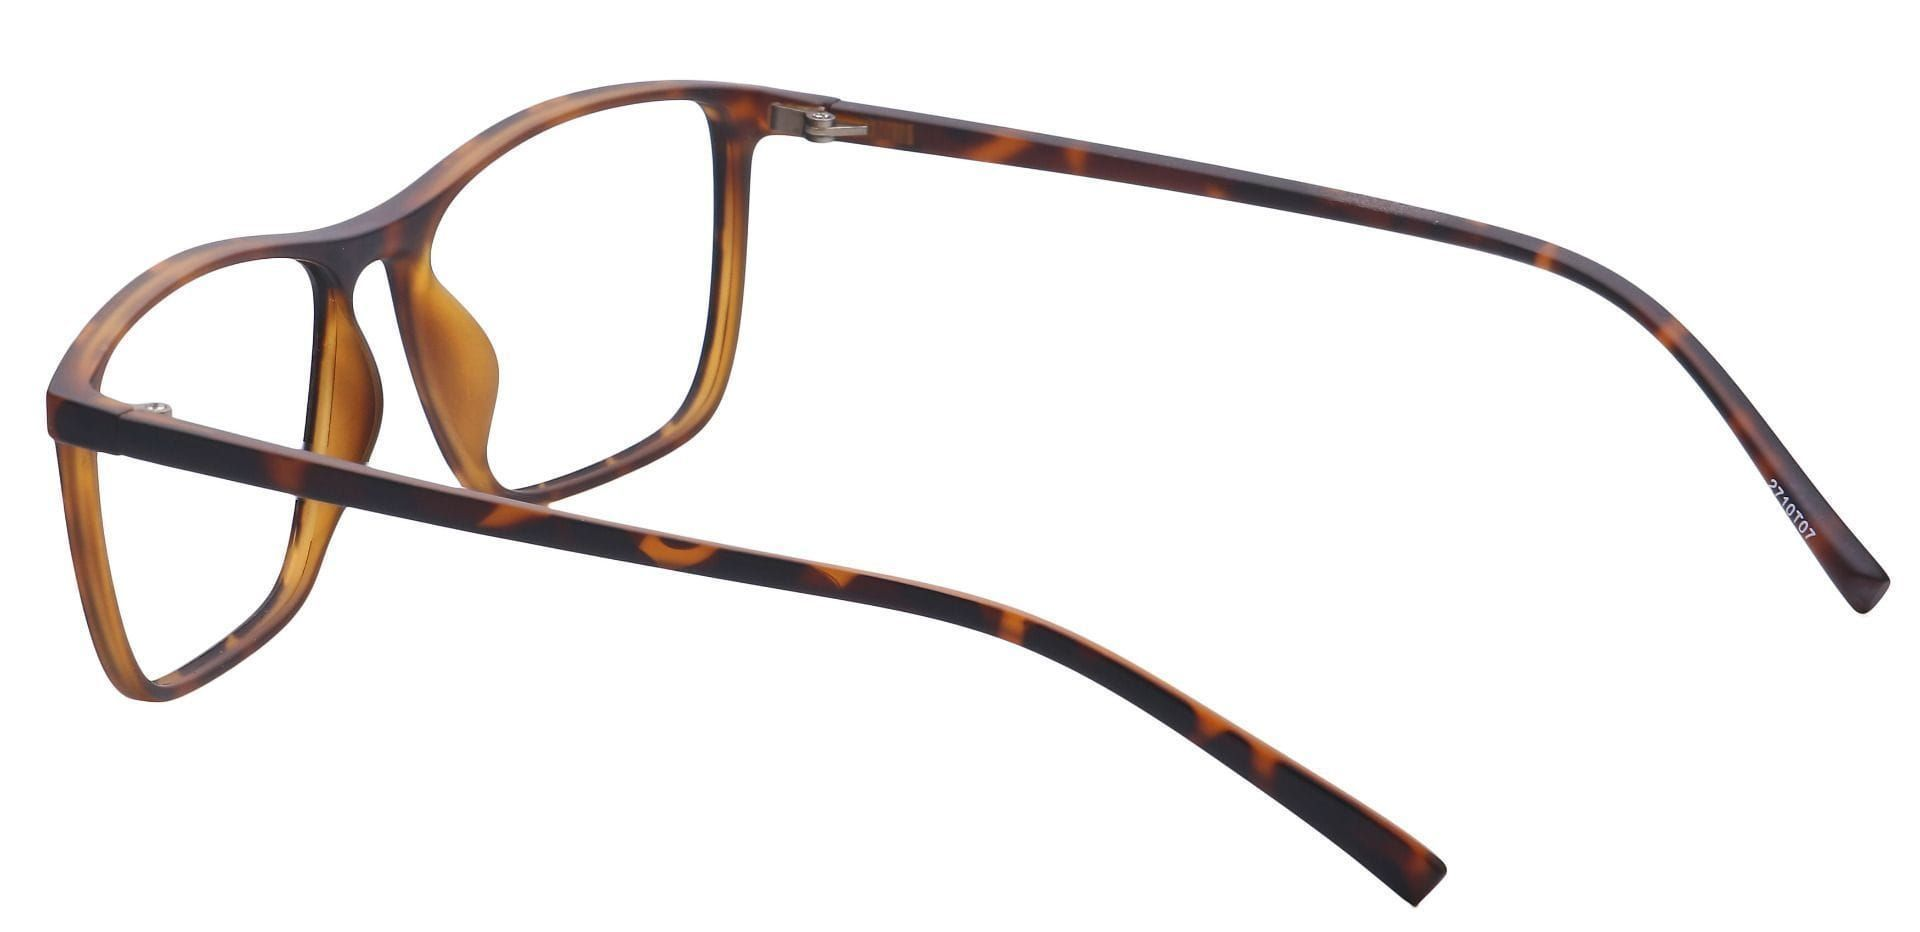 Candid Rectangle Eyeglasses Frame - Tortoise